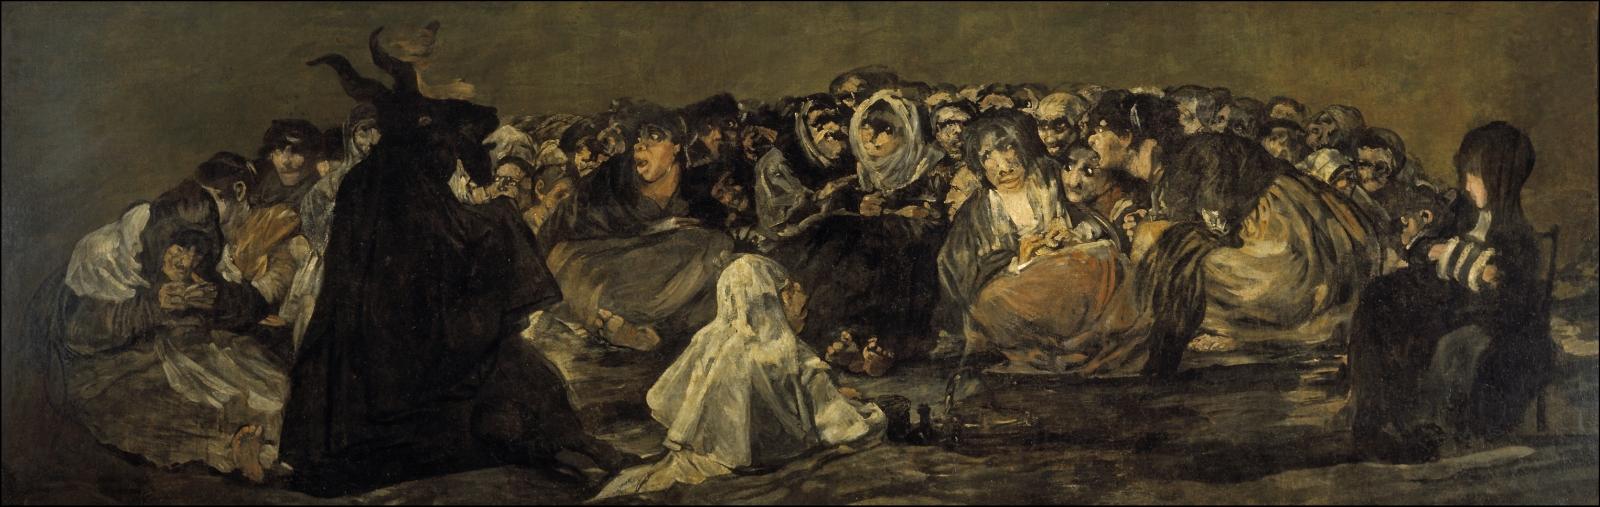 Goya disease